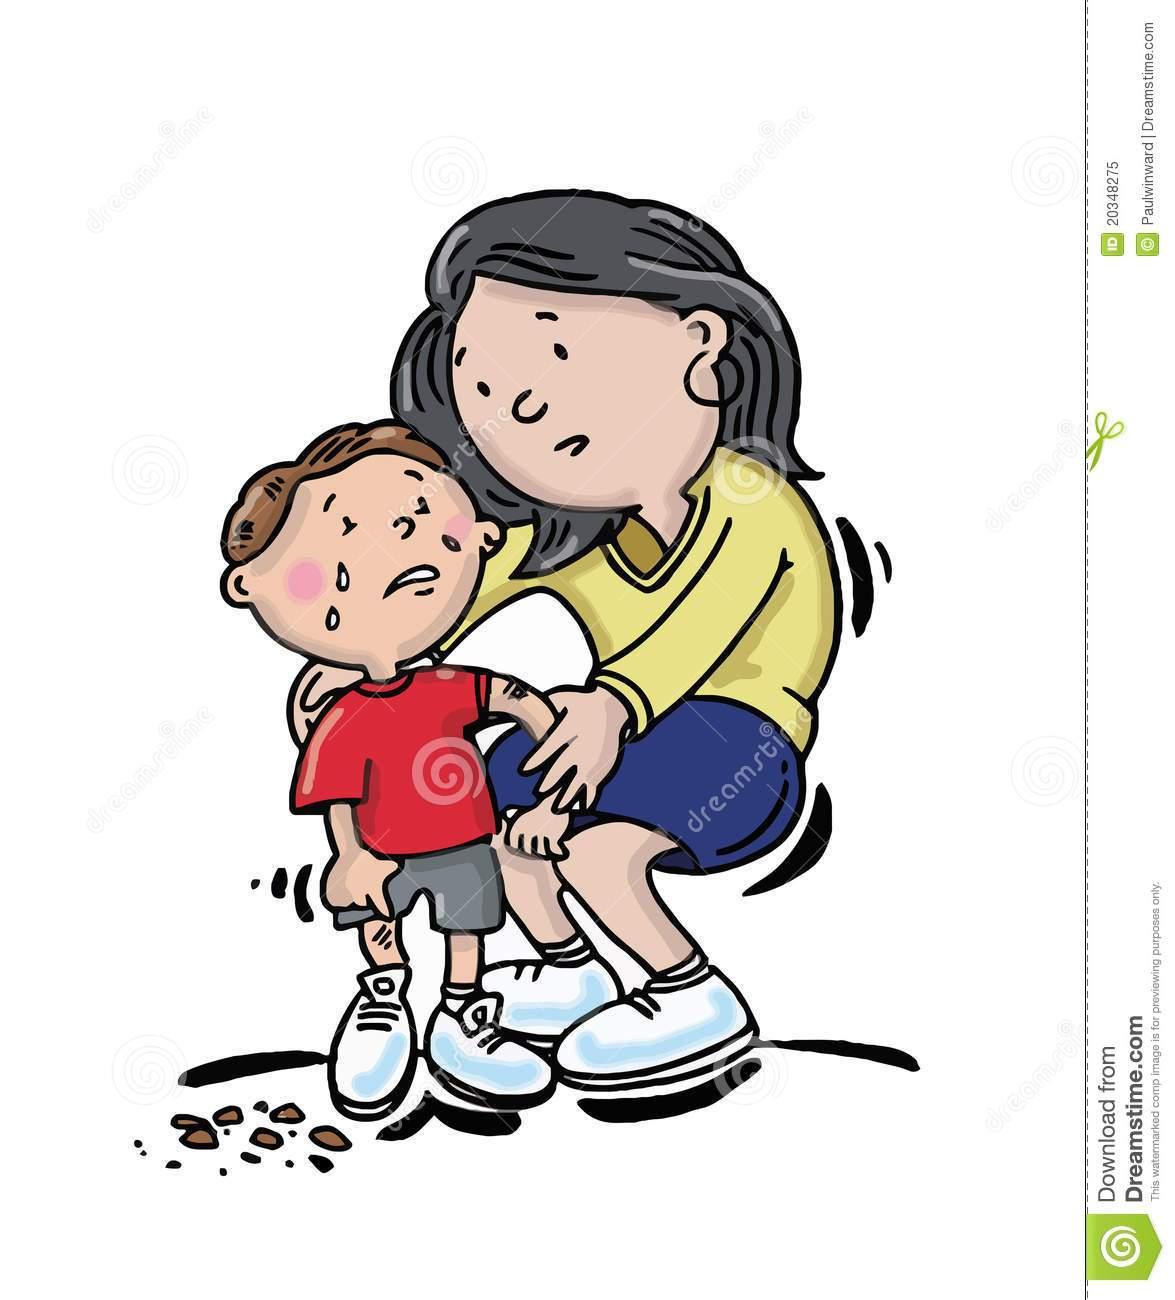 Hurt child clipart clipart black and white download Child hurt clipart 6 » Clipart Portal clipart black and white download